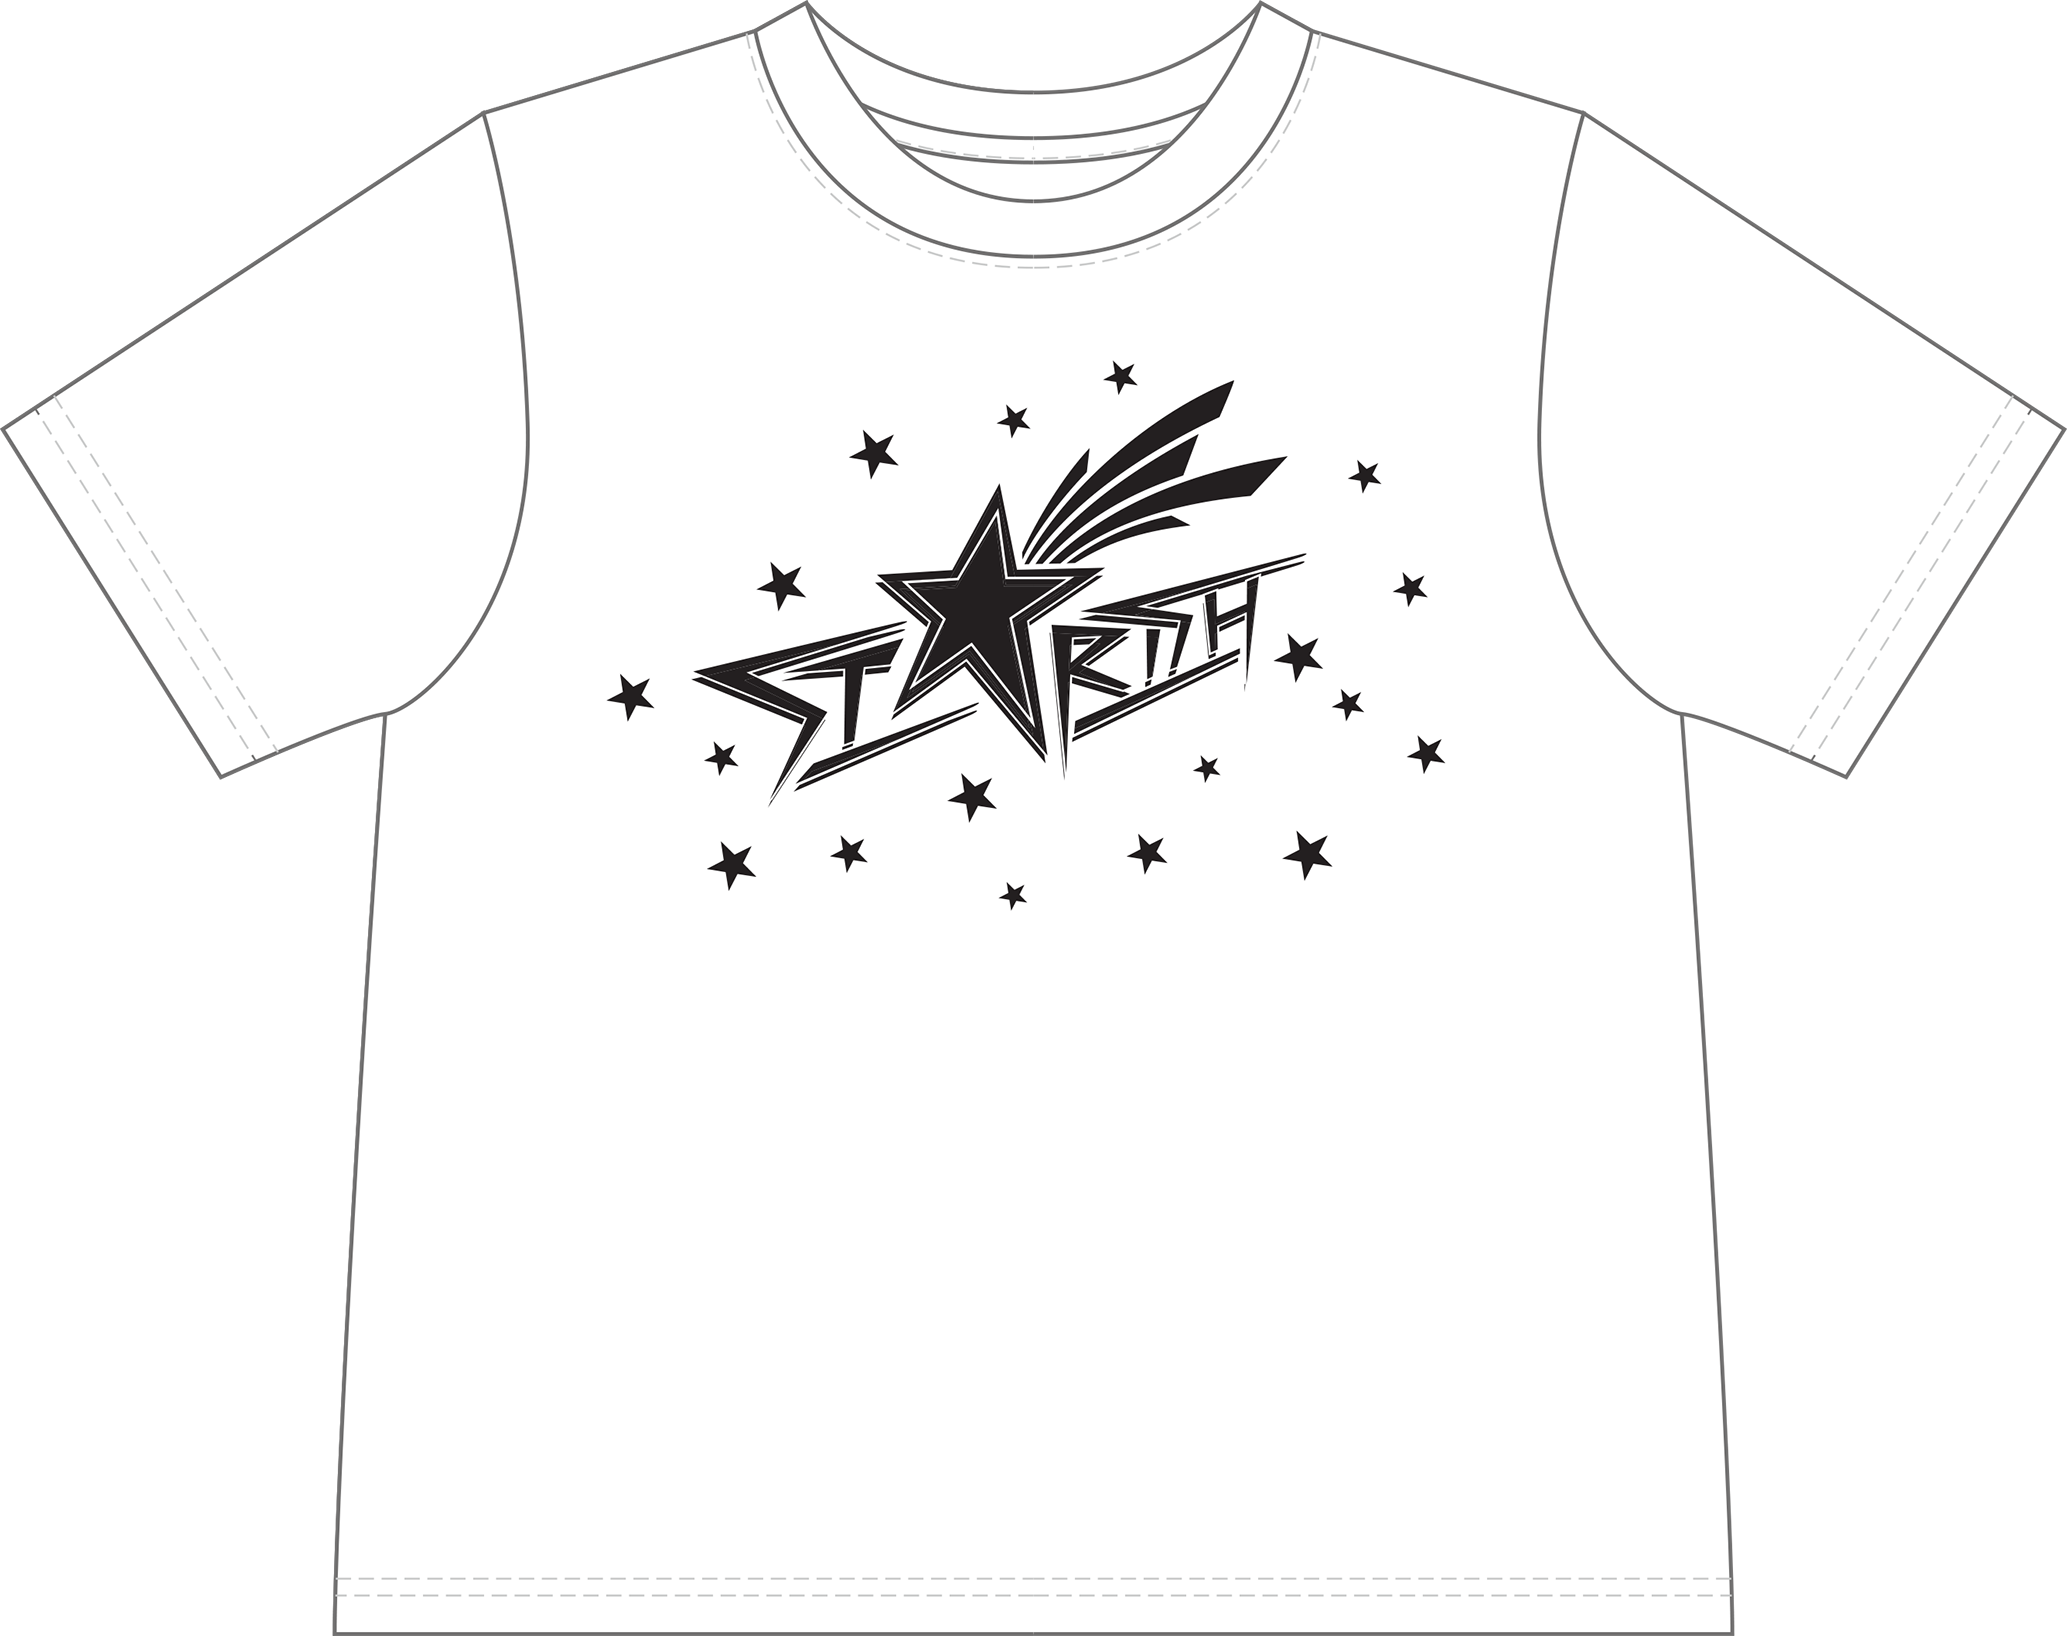 「UTA☆PRI EXPO-10th Anniversary-」TシャツST☆RISH